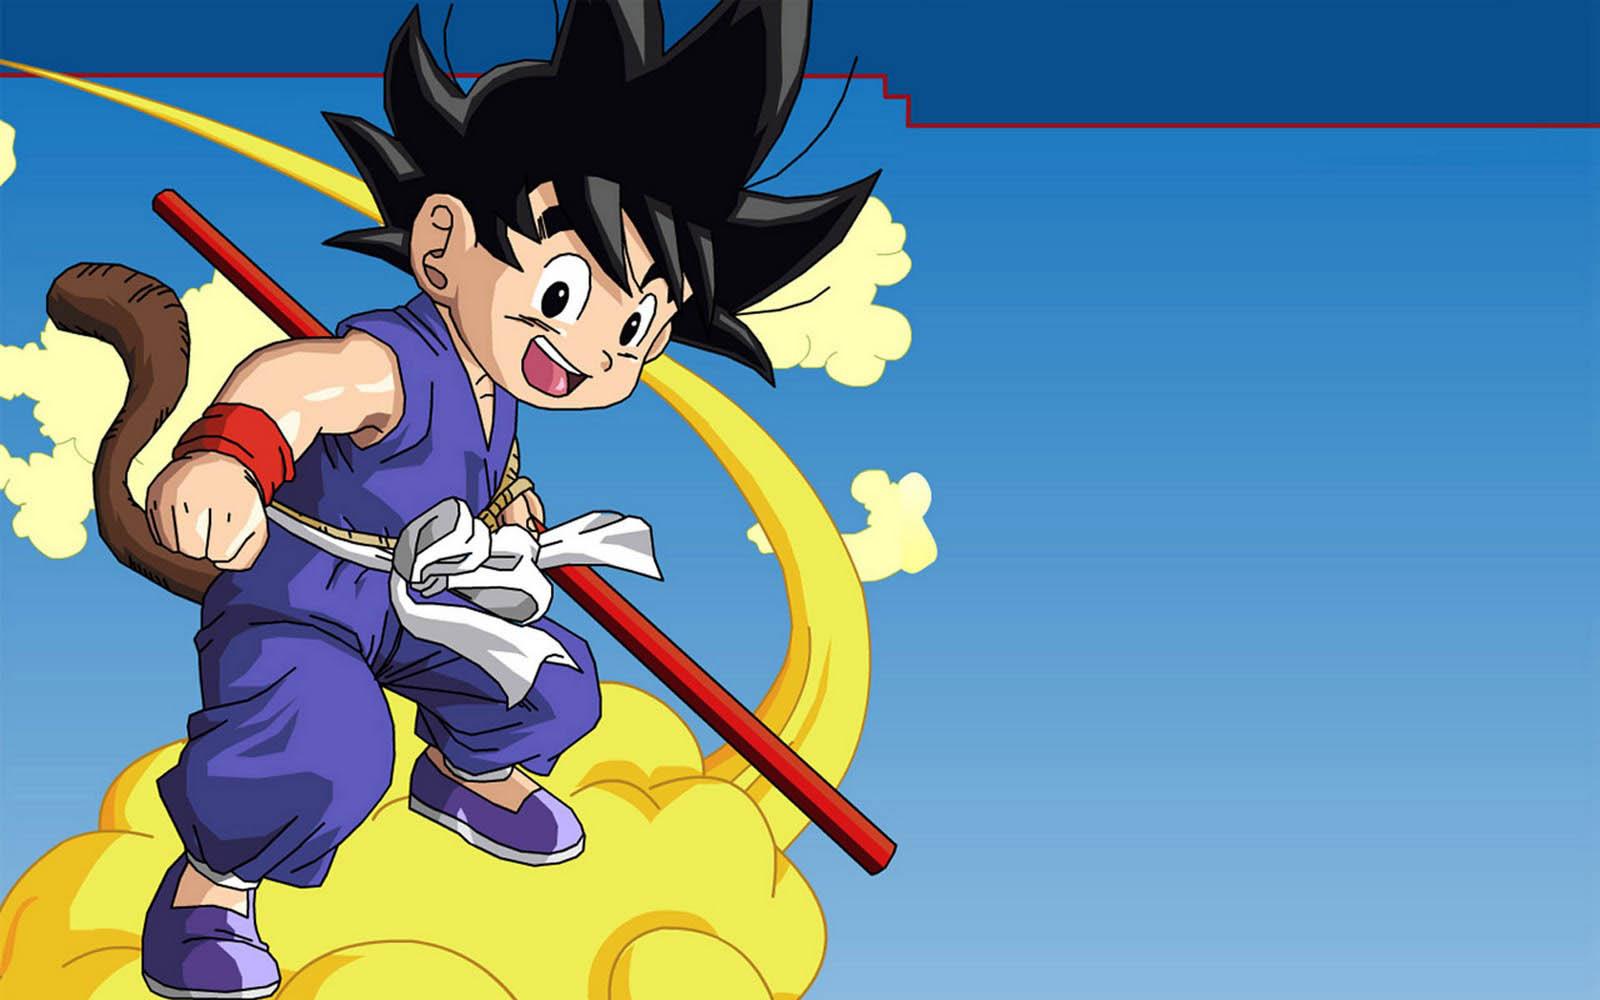 Unduh 7400 Koleksi Wallpaper Animasi Cartoon Bergerak HD Terbaik